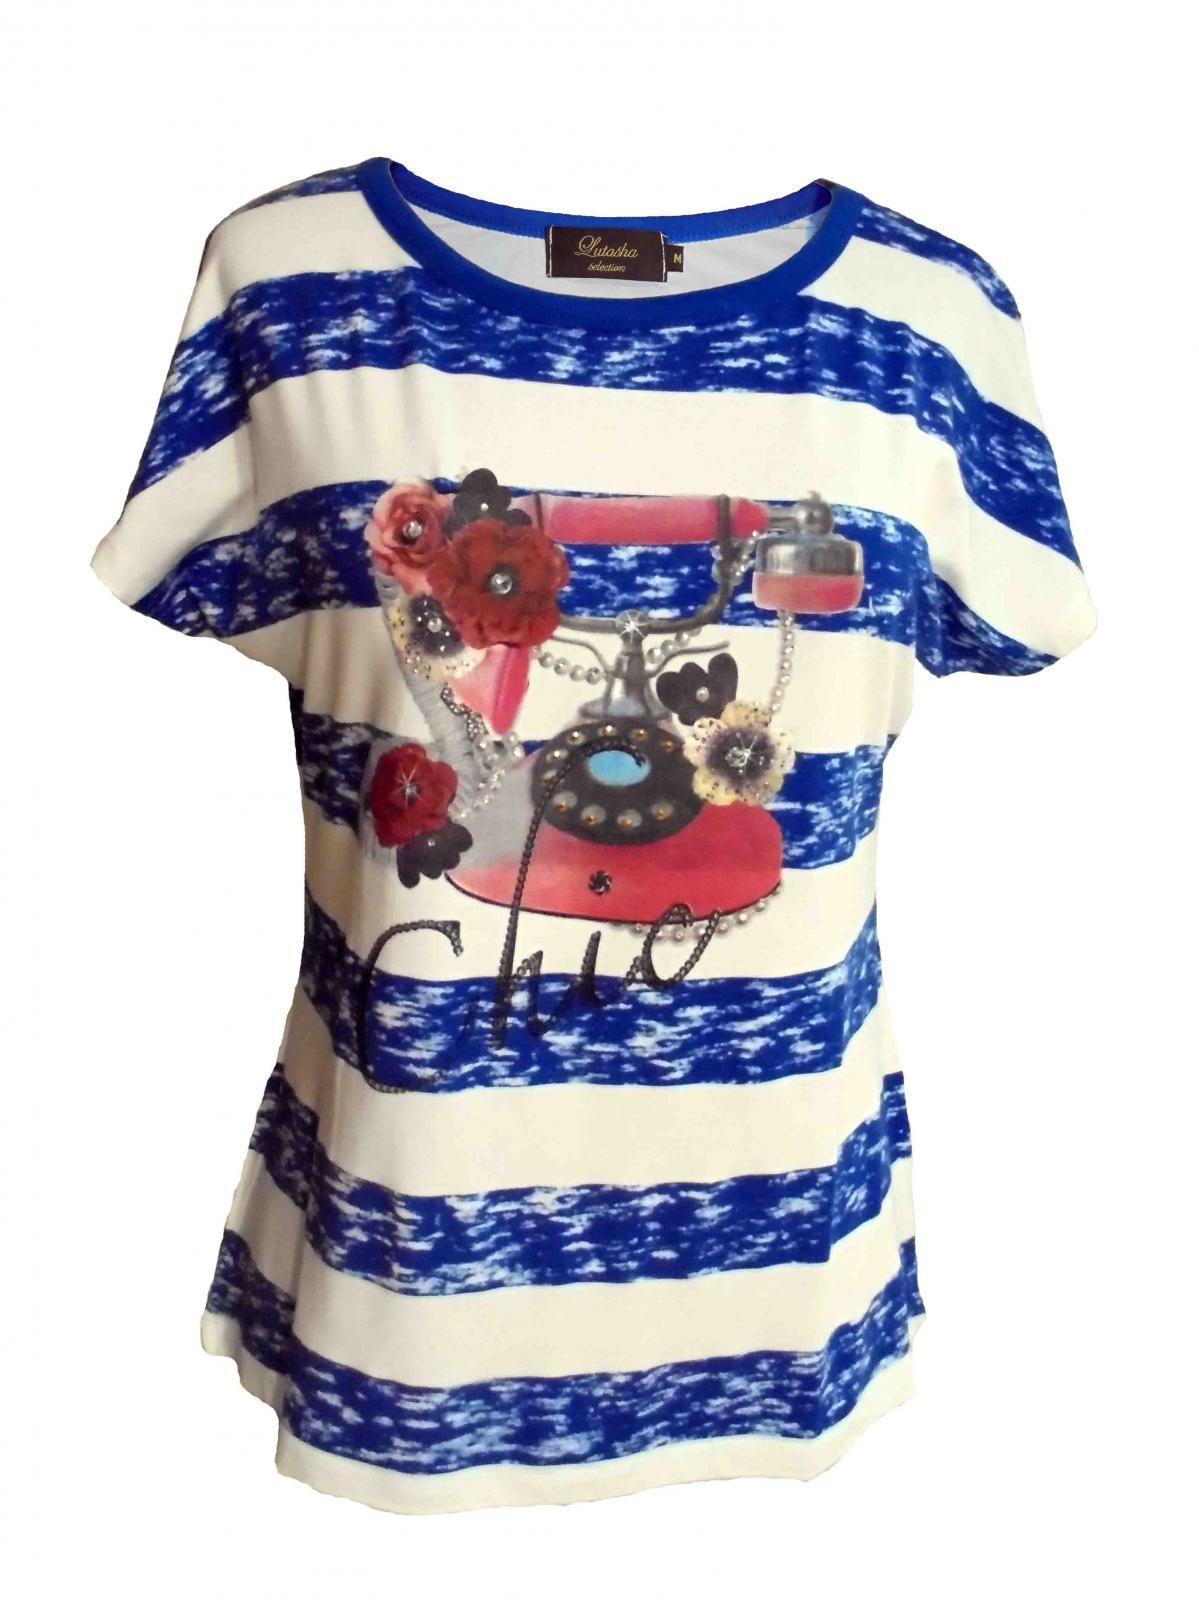 CaídoRayas Horizontales Camiseta MujerManga Hombro Estampada De 3c45SARLjq